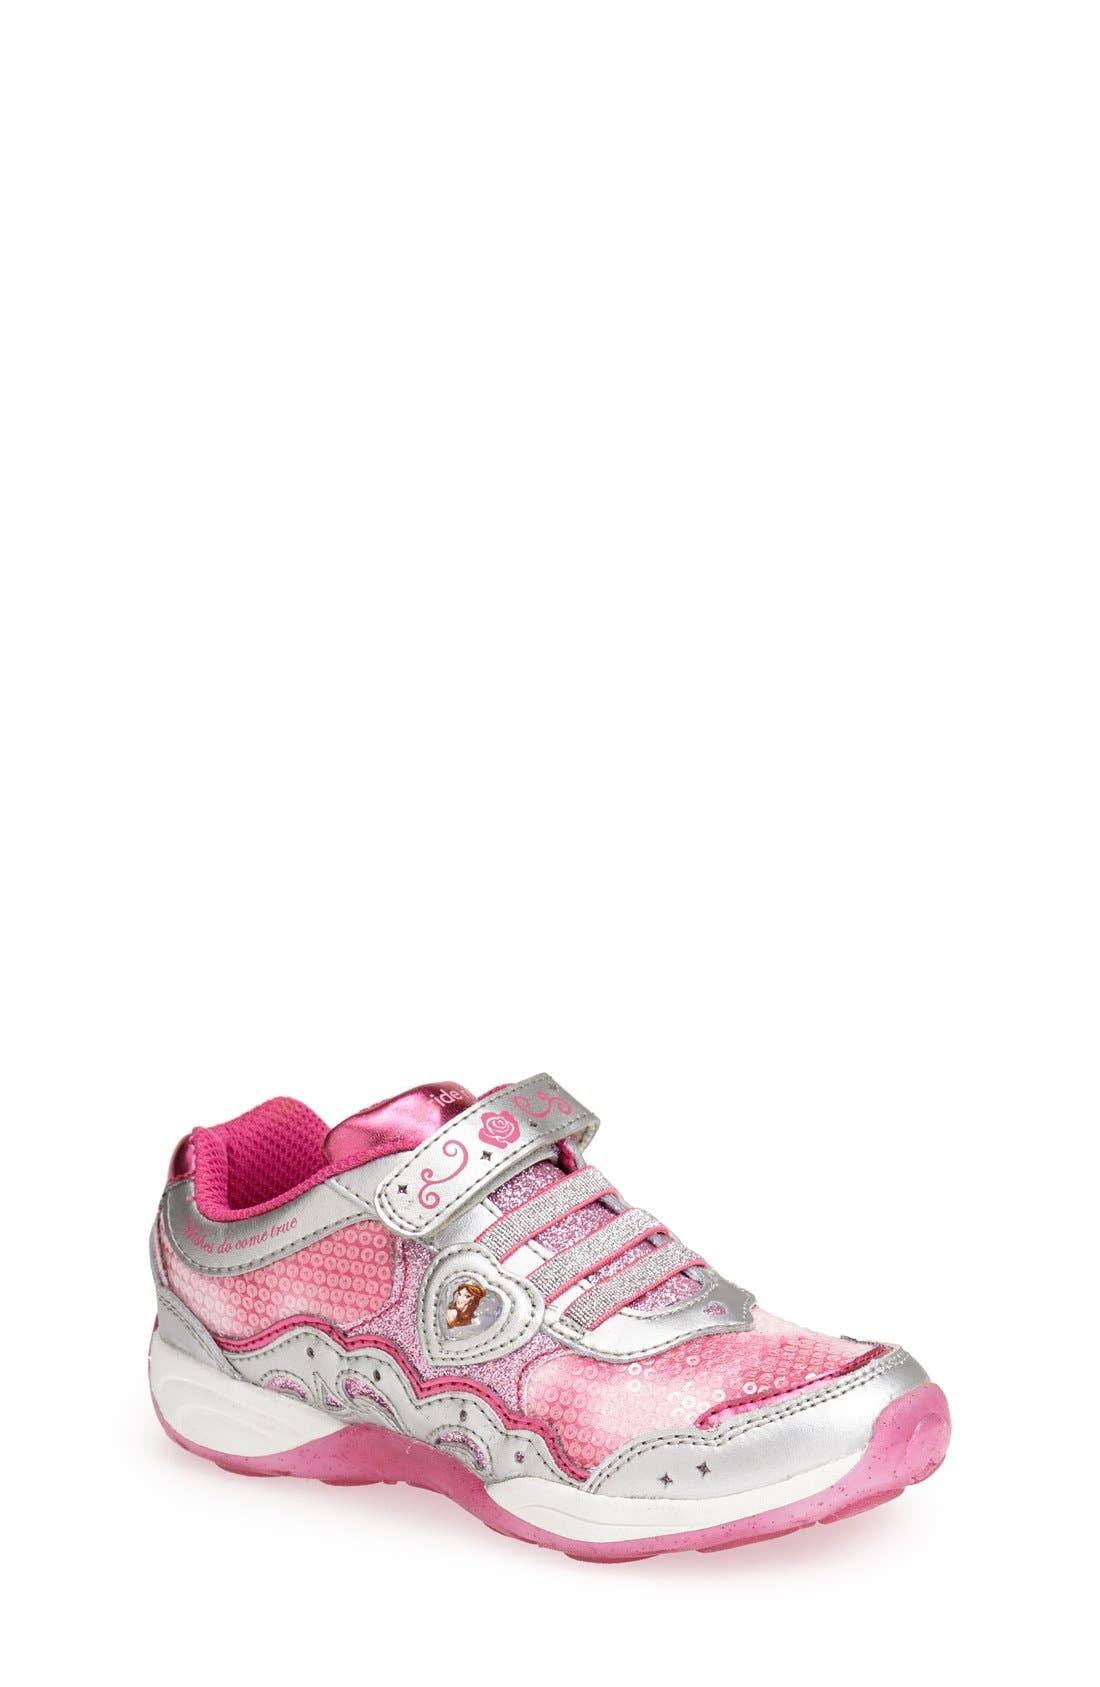 Alternate Image 1 Selected - Stride Rite 'Disney Wish Lights - Belle' Light-Up Sneaker (Walker, Toddler & Little Kid)